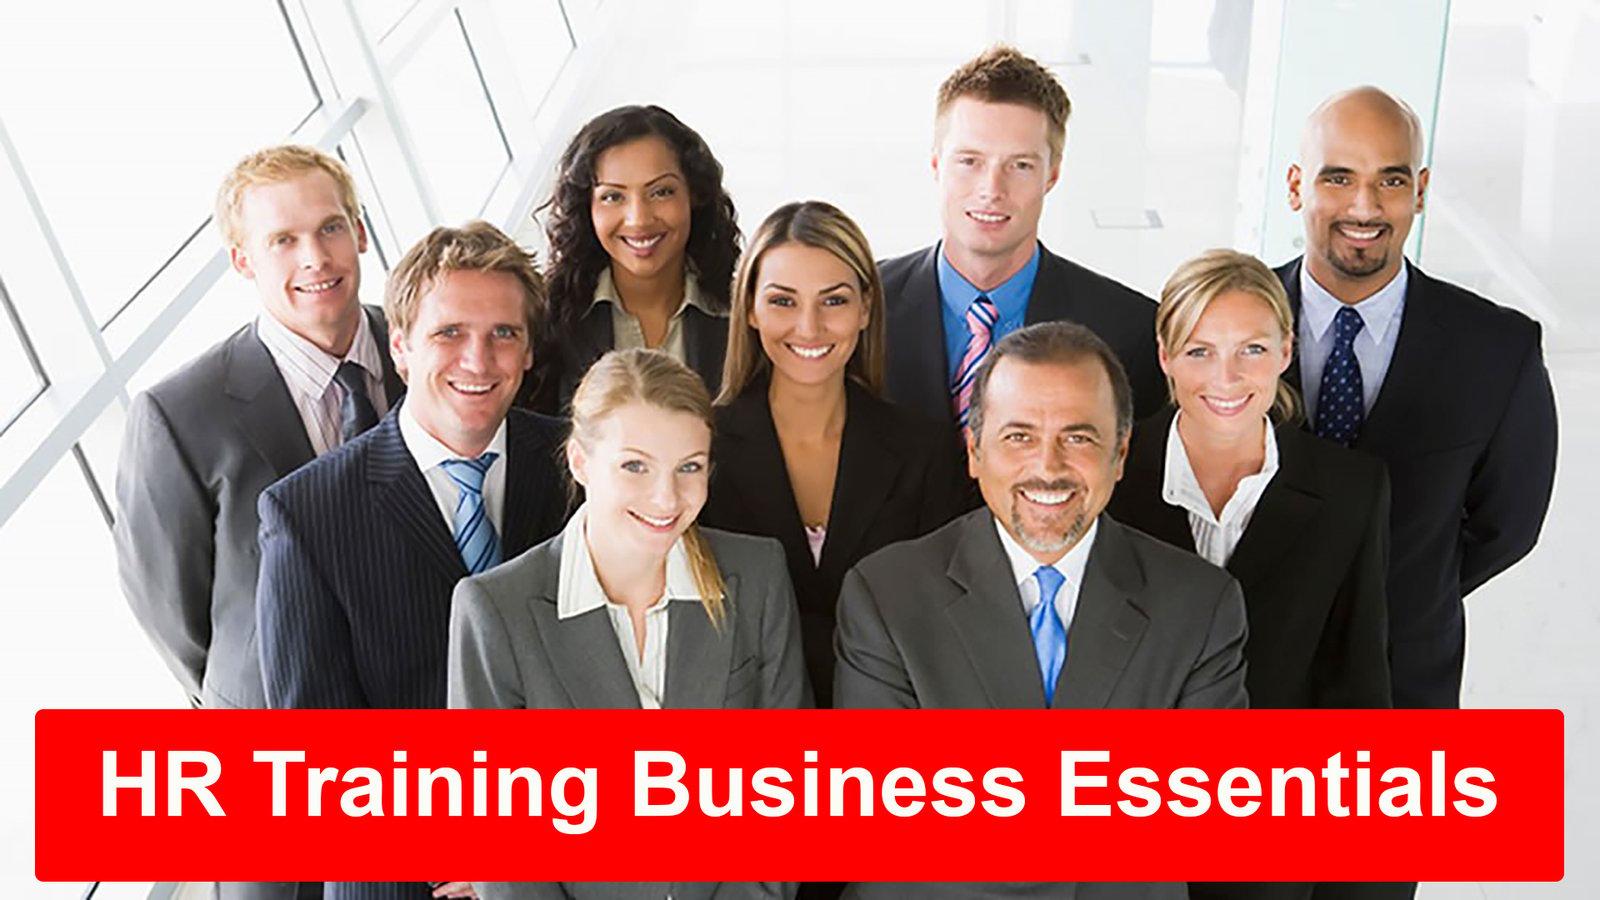 Business Management & HR Training